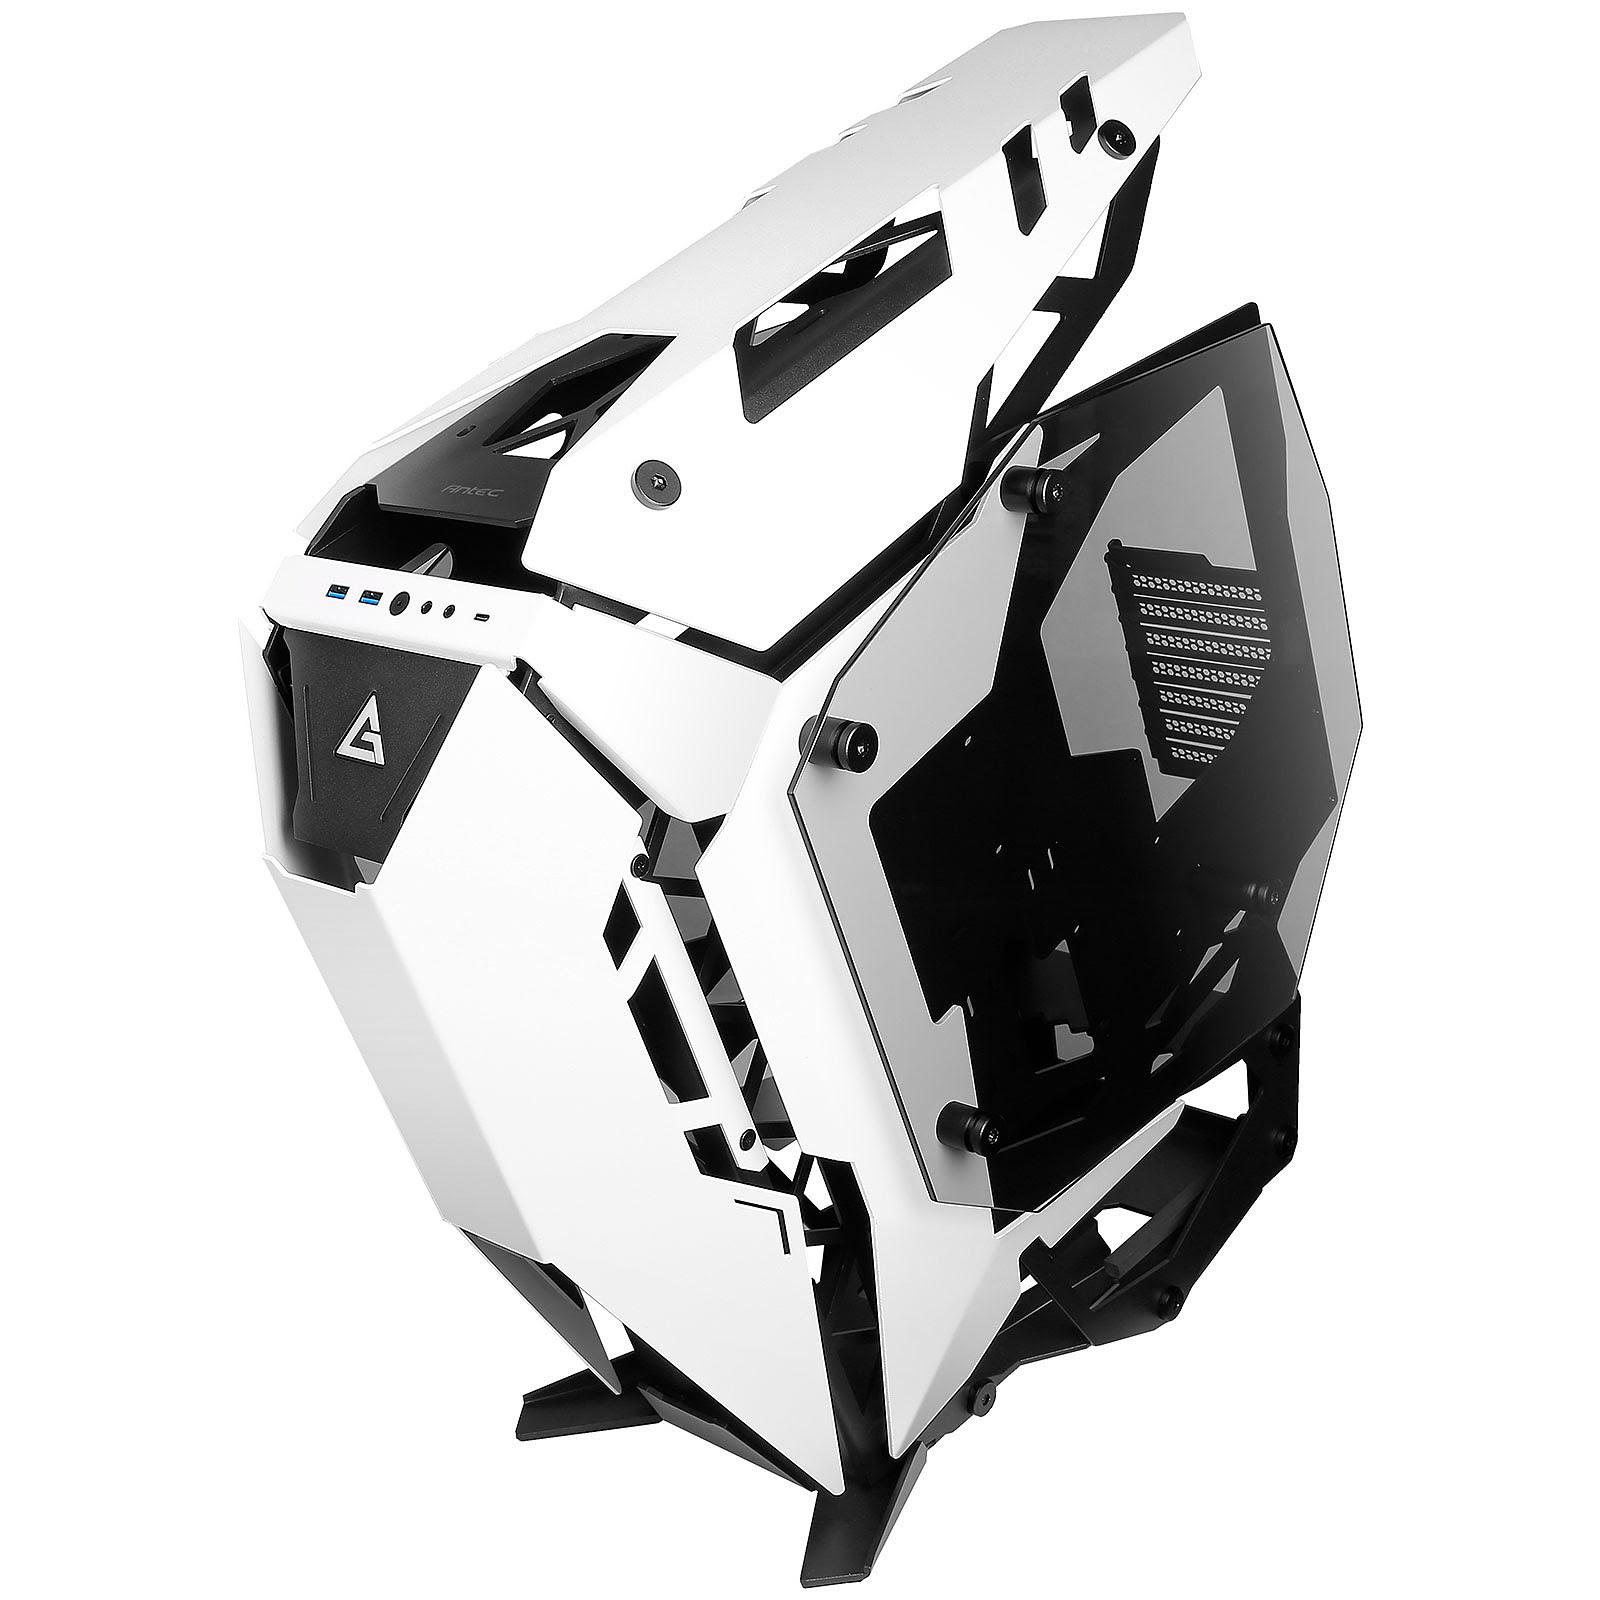 Antec TORQUE Black/White Blanc - Boîtier PC Antec - Cybertek.fr - 1